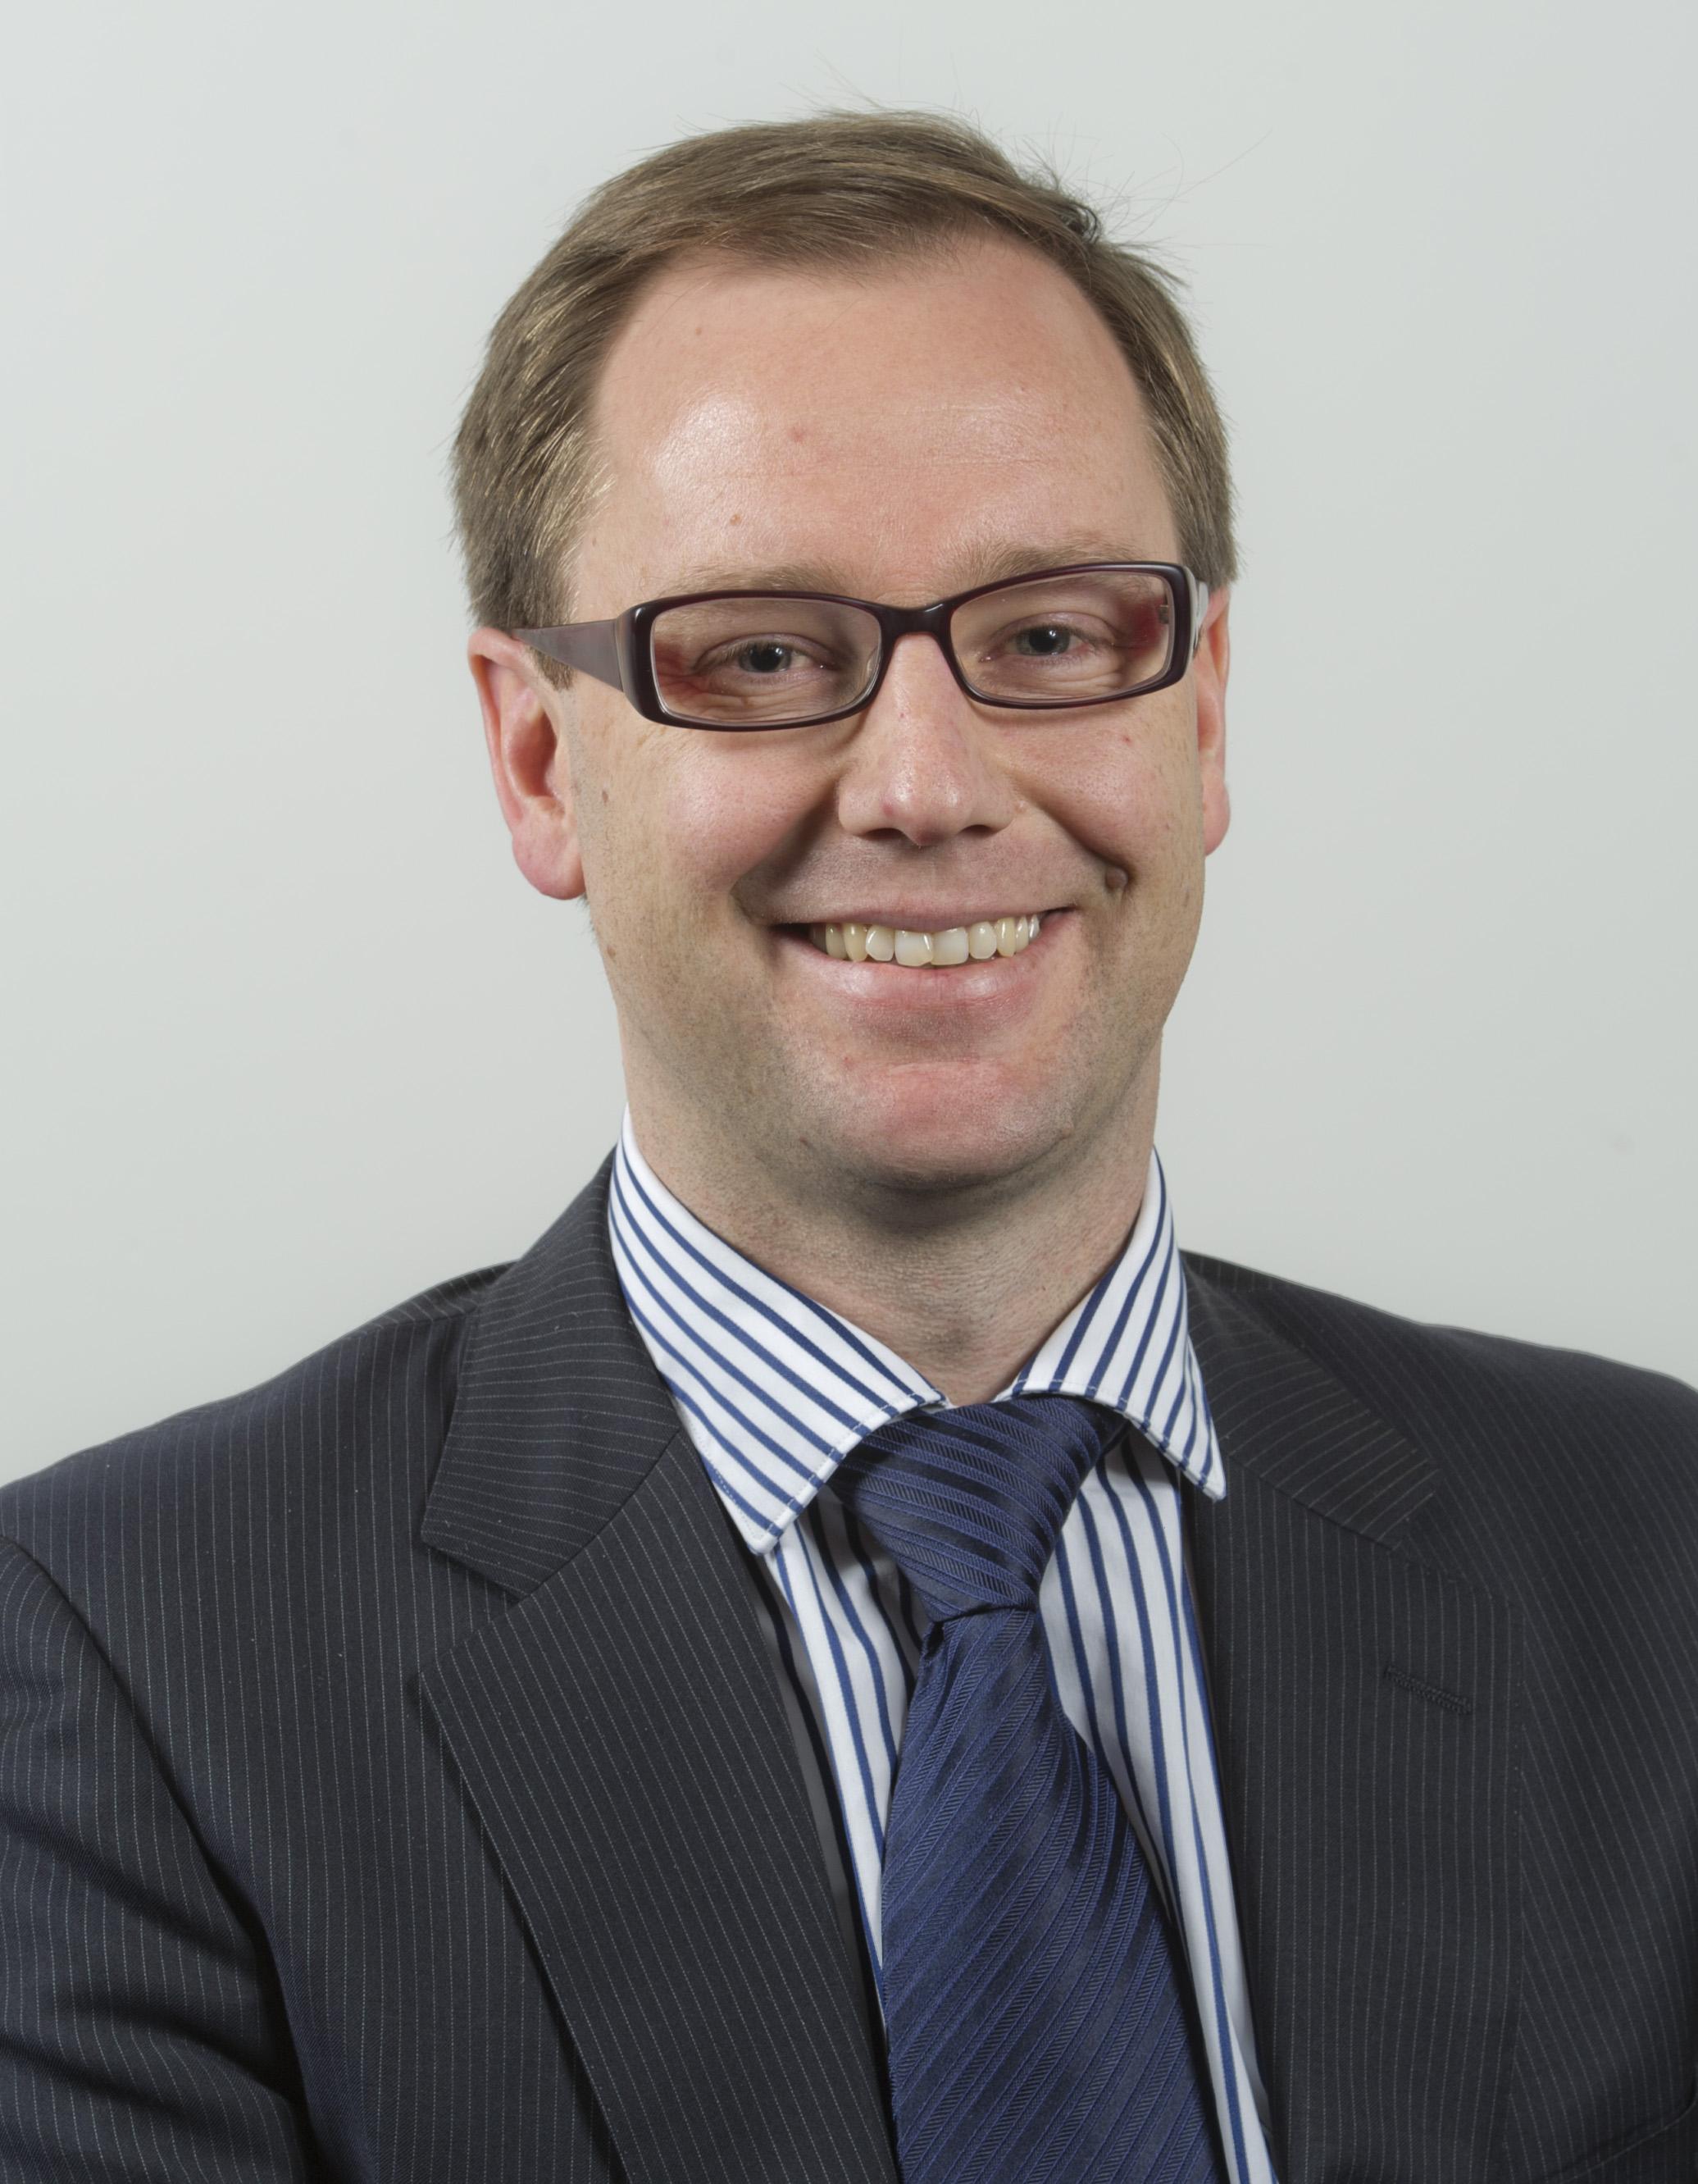 David Oldfield, LLB